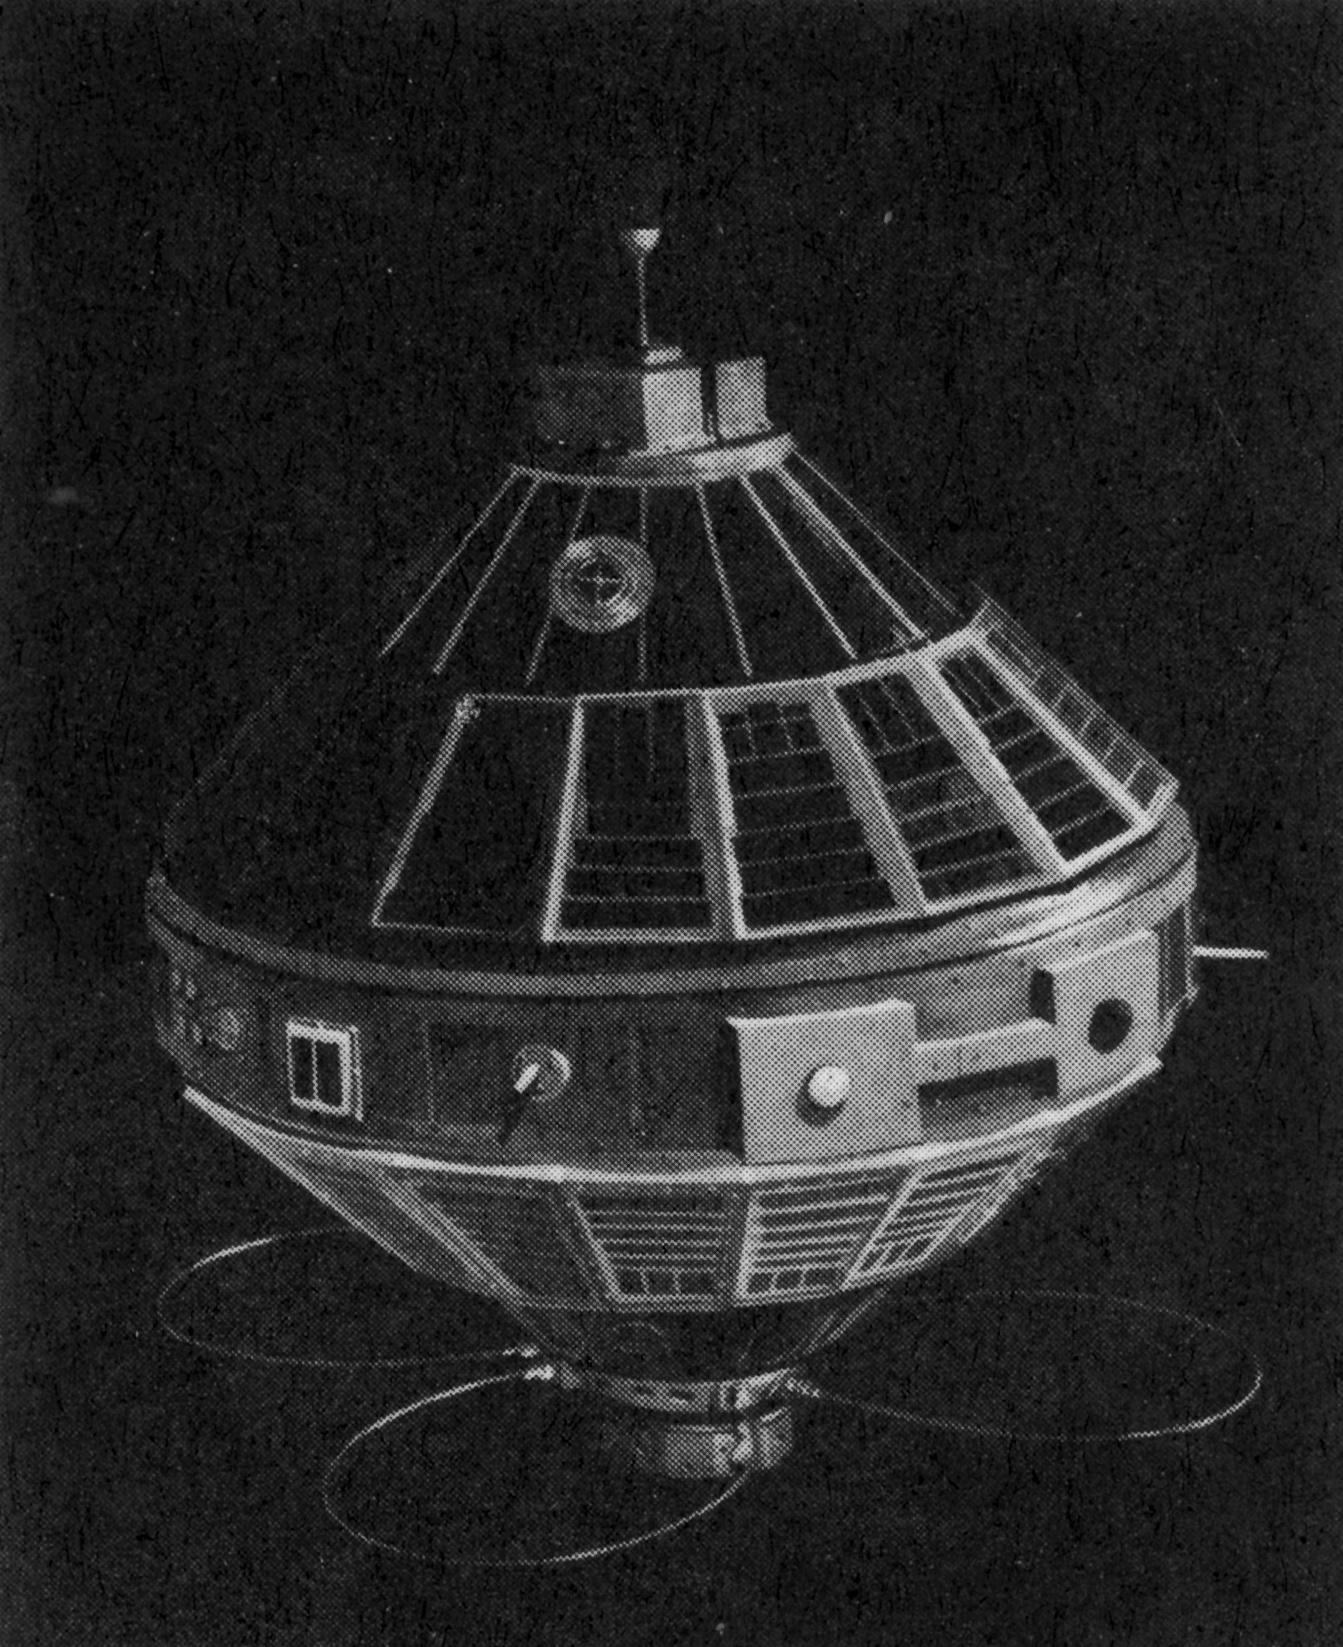 Nasa nssdca spacecraft details image of the explorer 7 spacecraft sciox Image collections